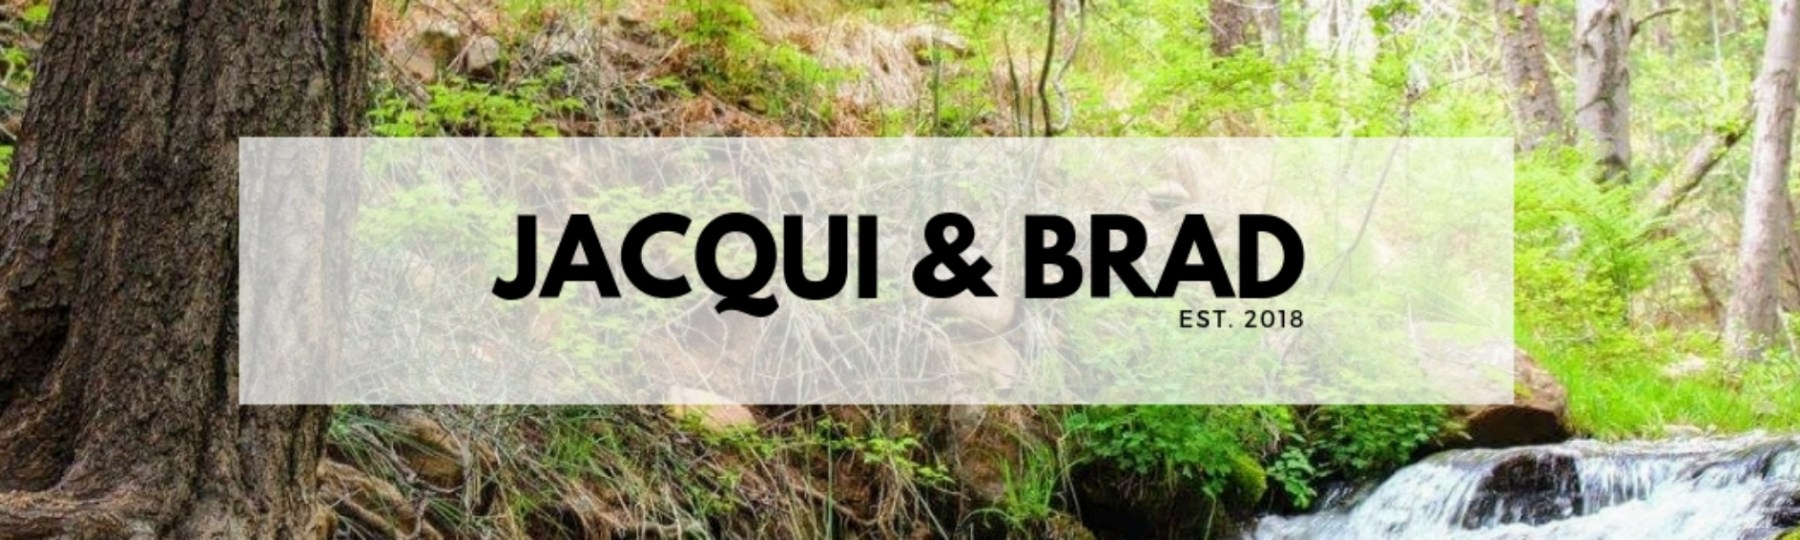 Jacqui & Brad Store